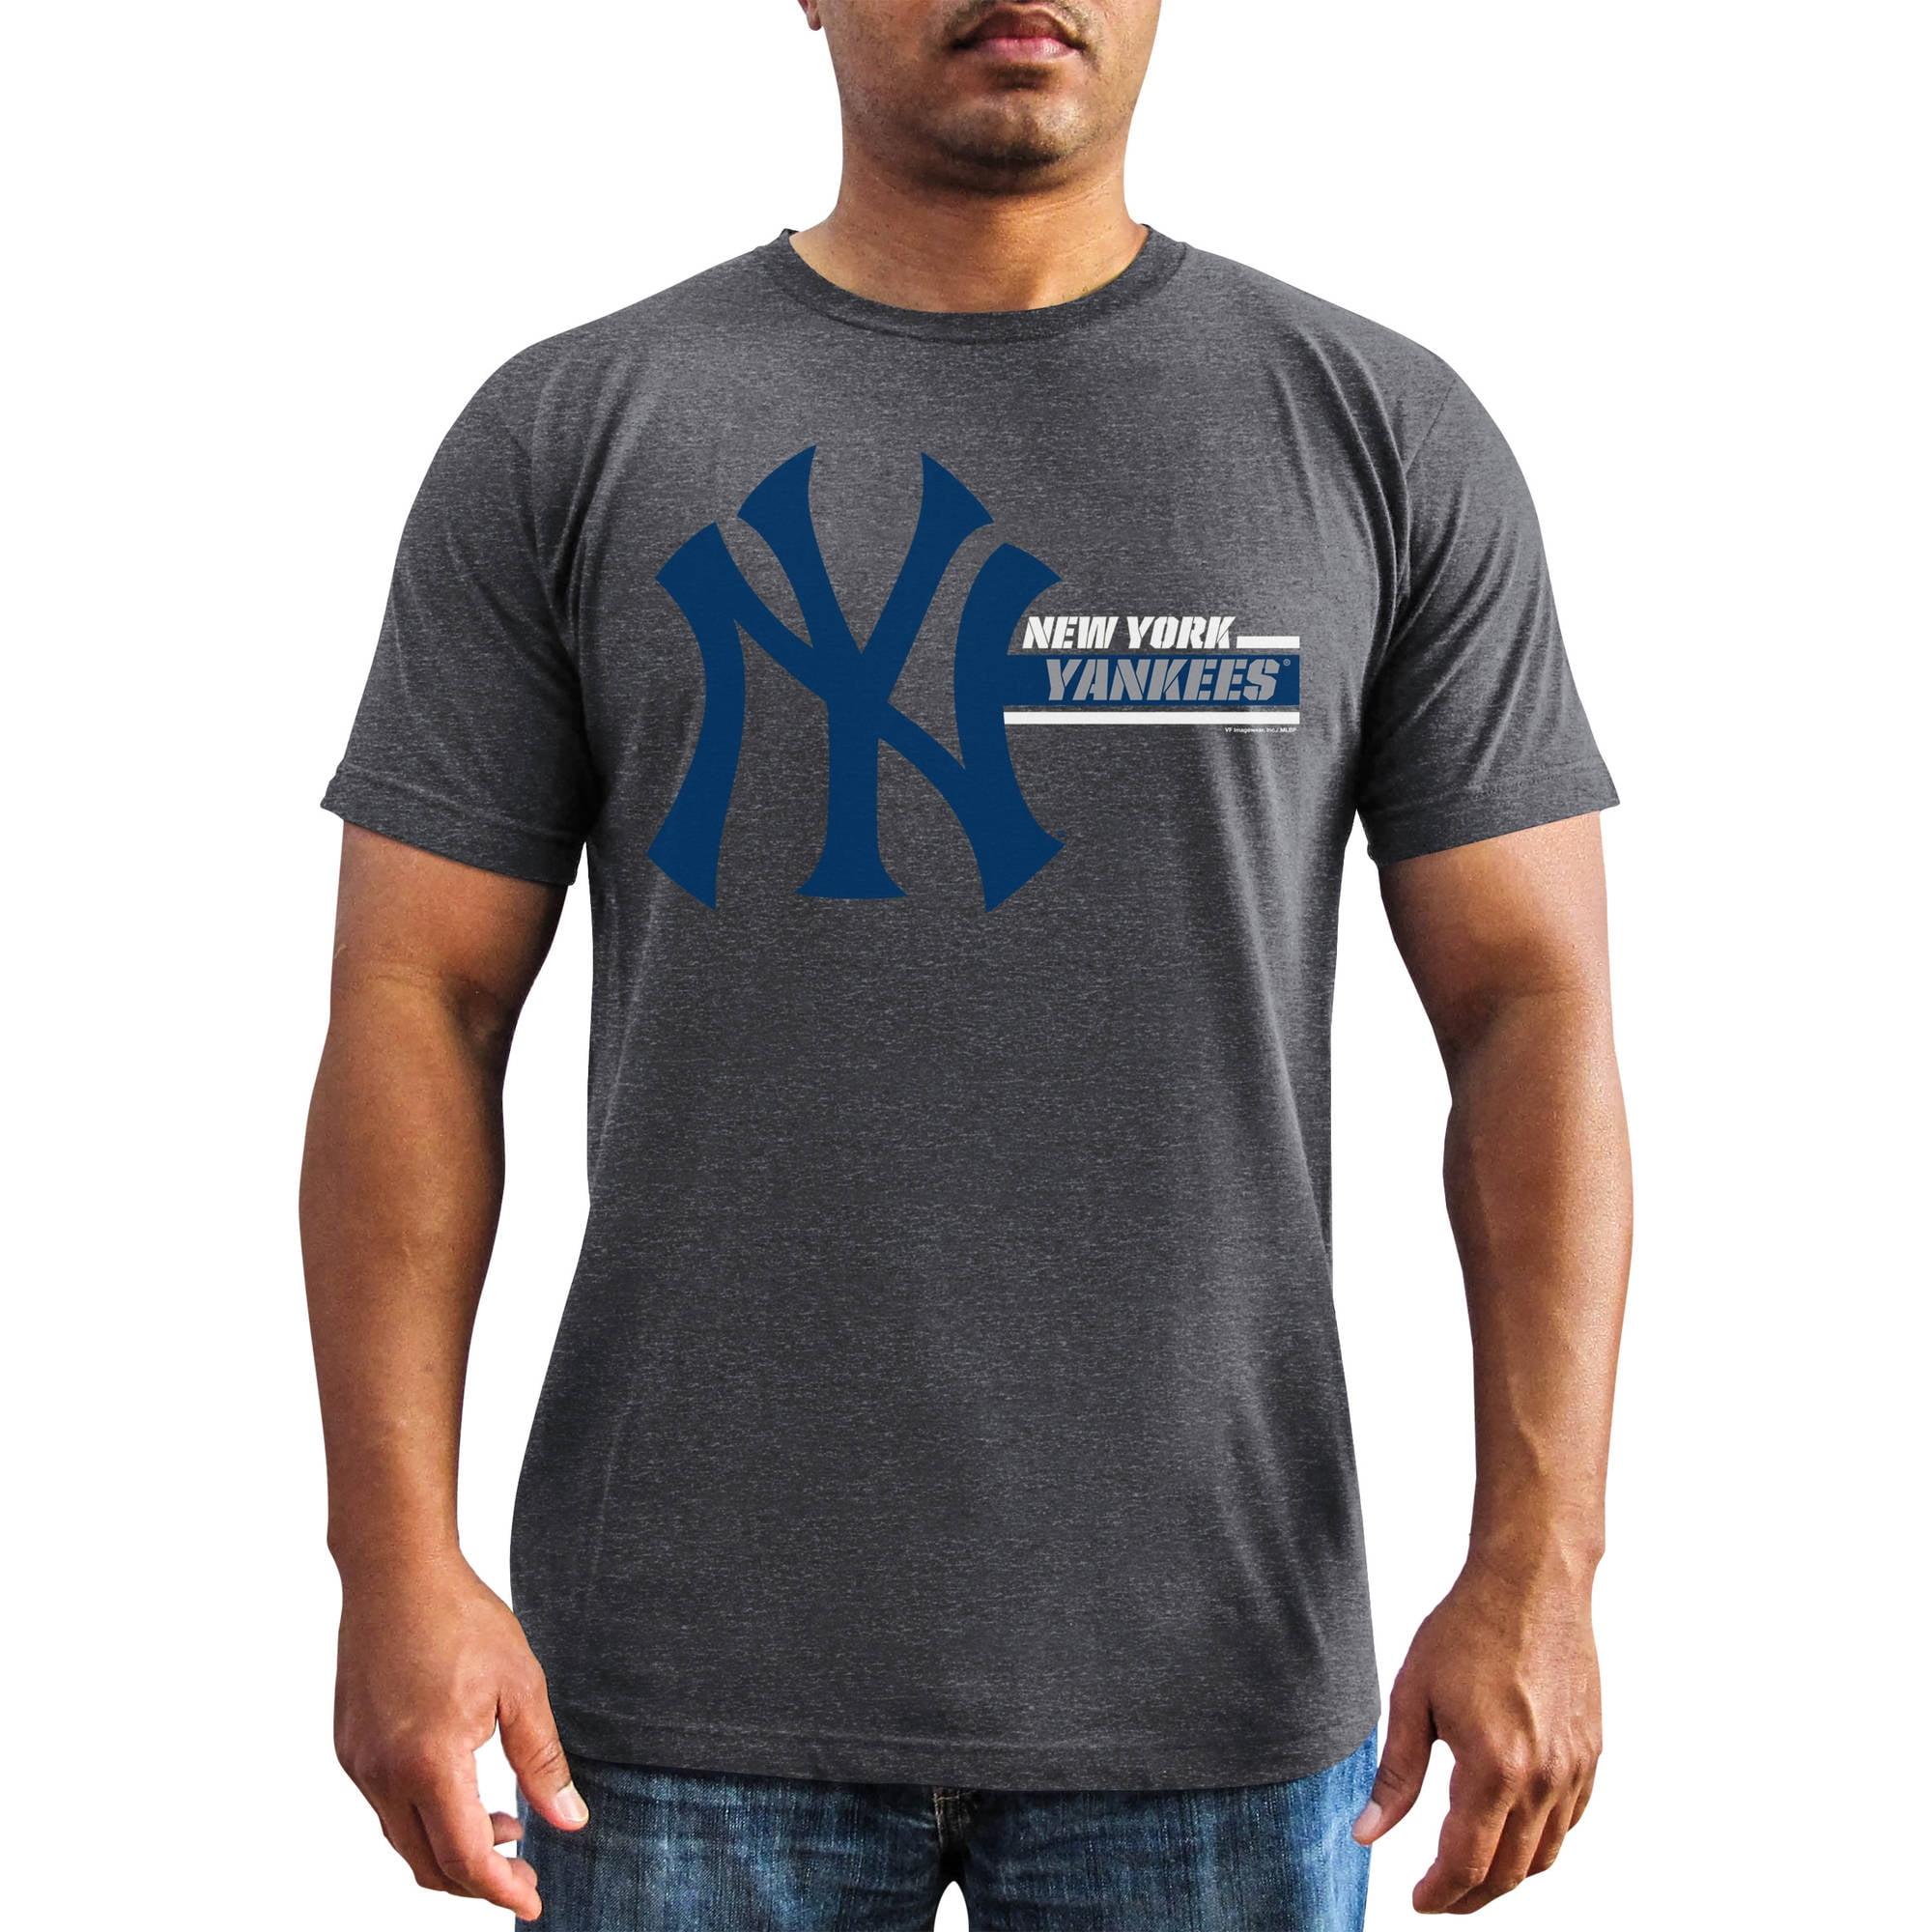 MLB - Mens New York Yankees Short Sleeve Team Tee